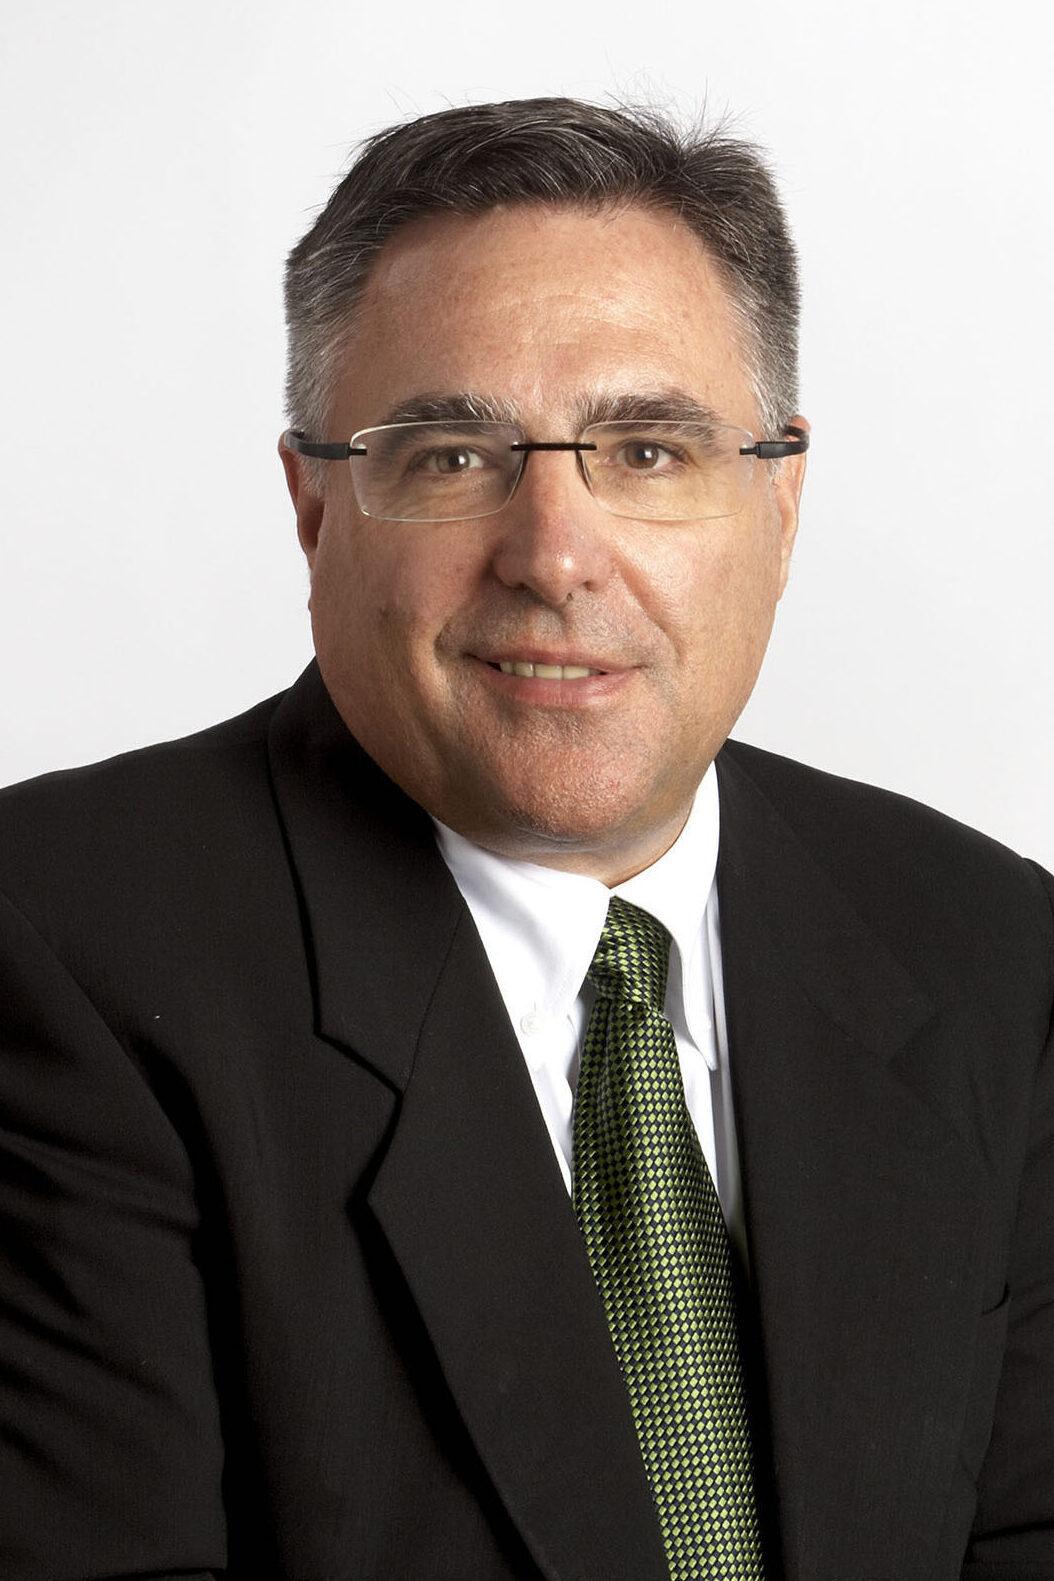 Jim Hansen, Foundation donor